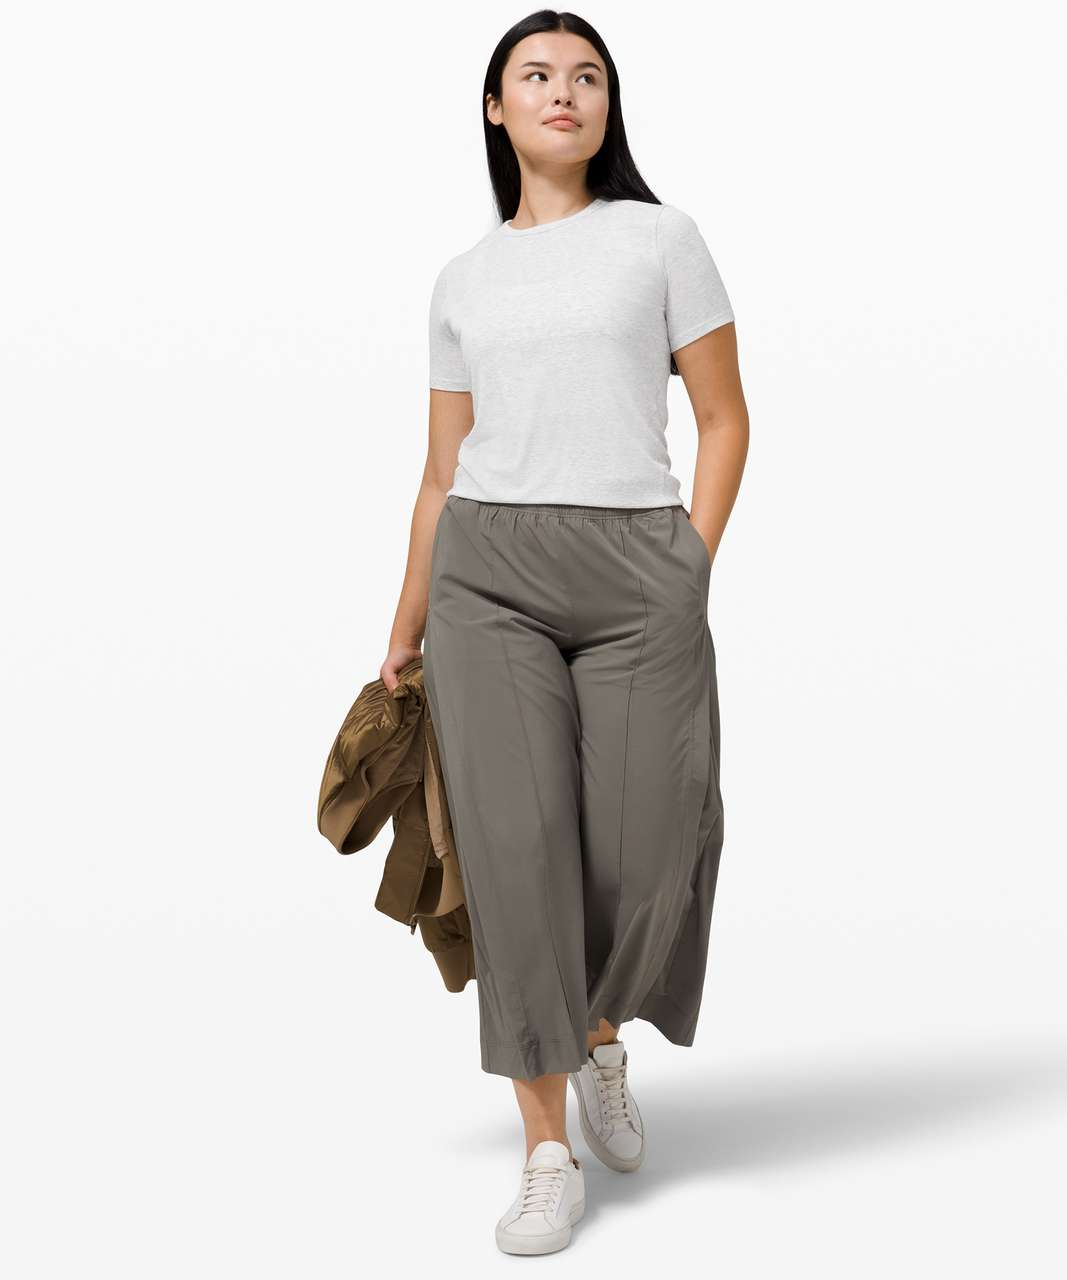 Lululemon Hold Tight Short Sleeve - Heathered Core Ultra Light Grey